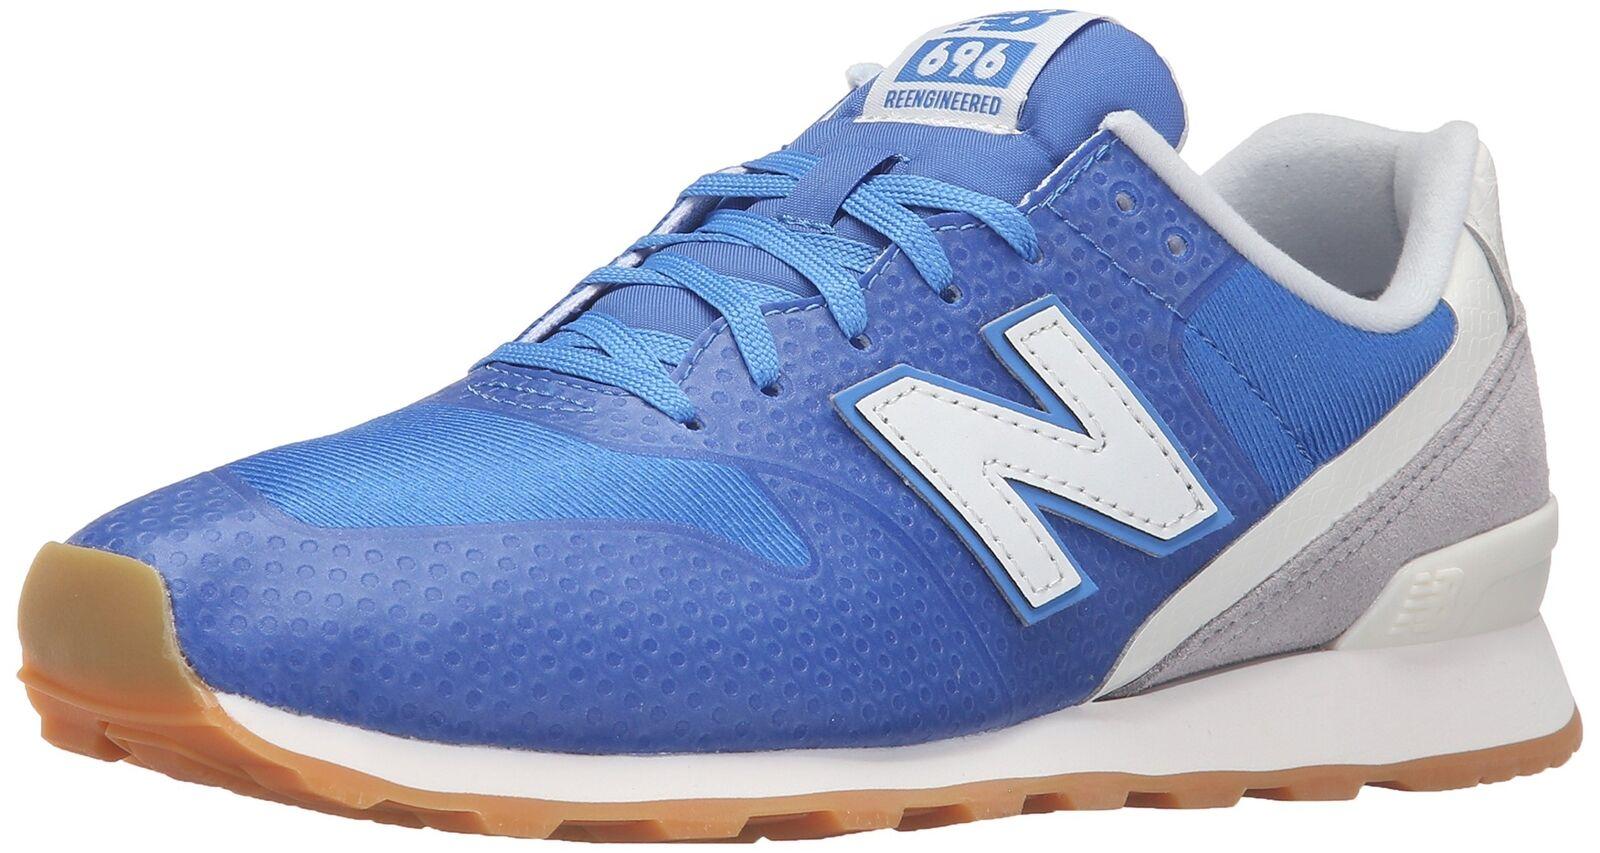 New New New Balance Women's 696 Hybrid Pack Lifestyle Sneaker, bluee Grey, 9 B US a87567